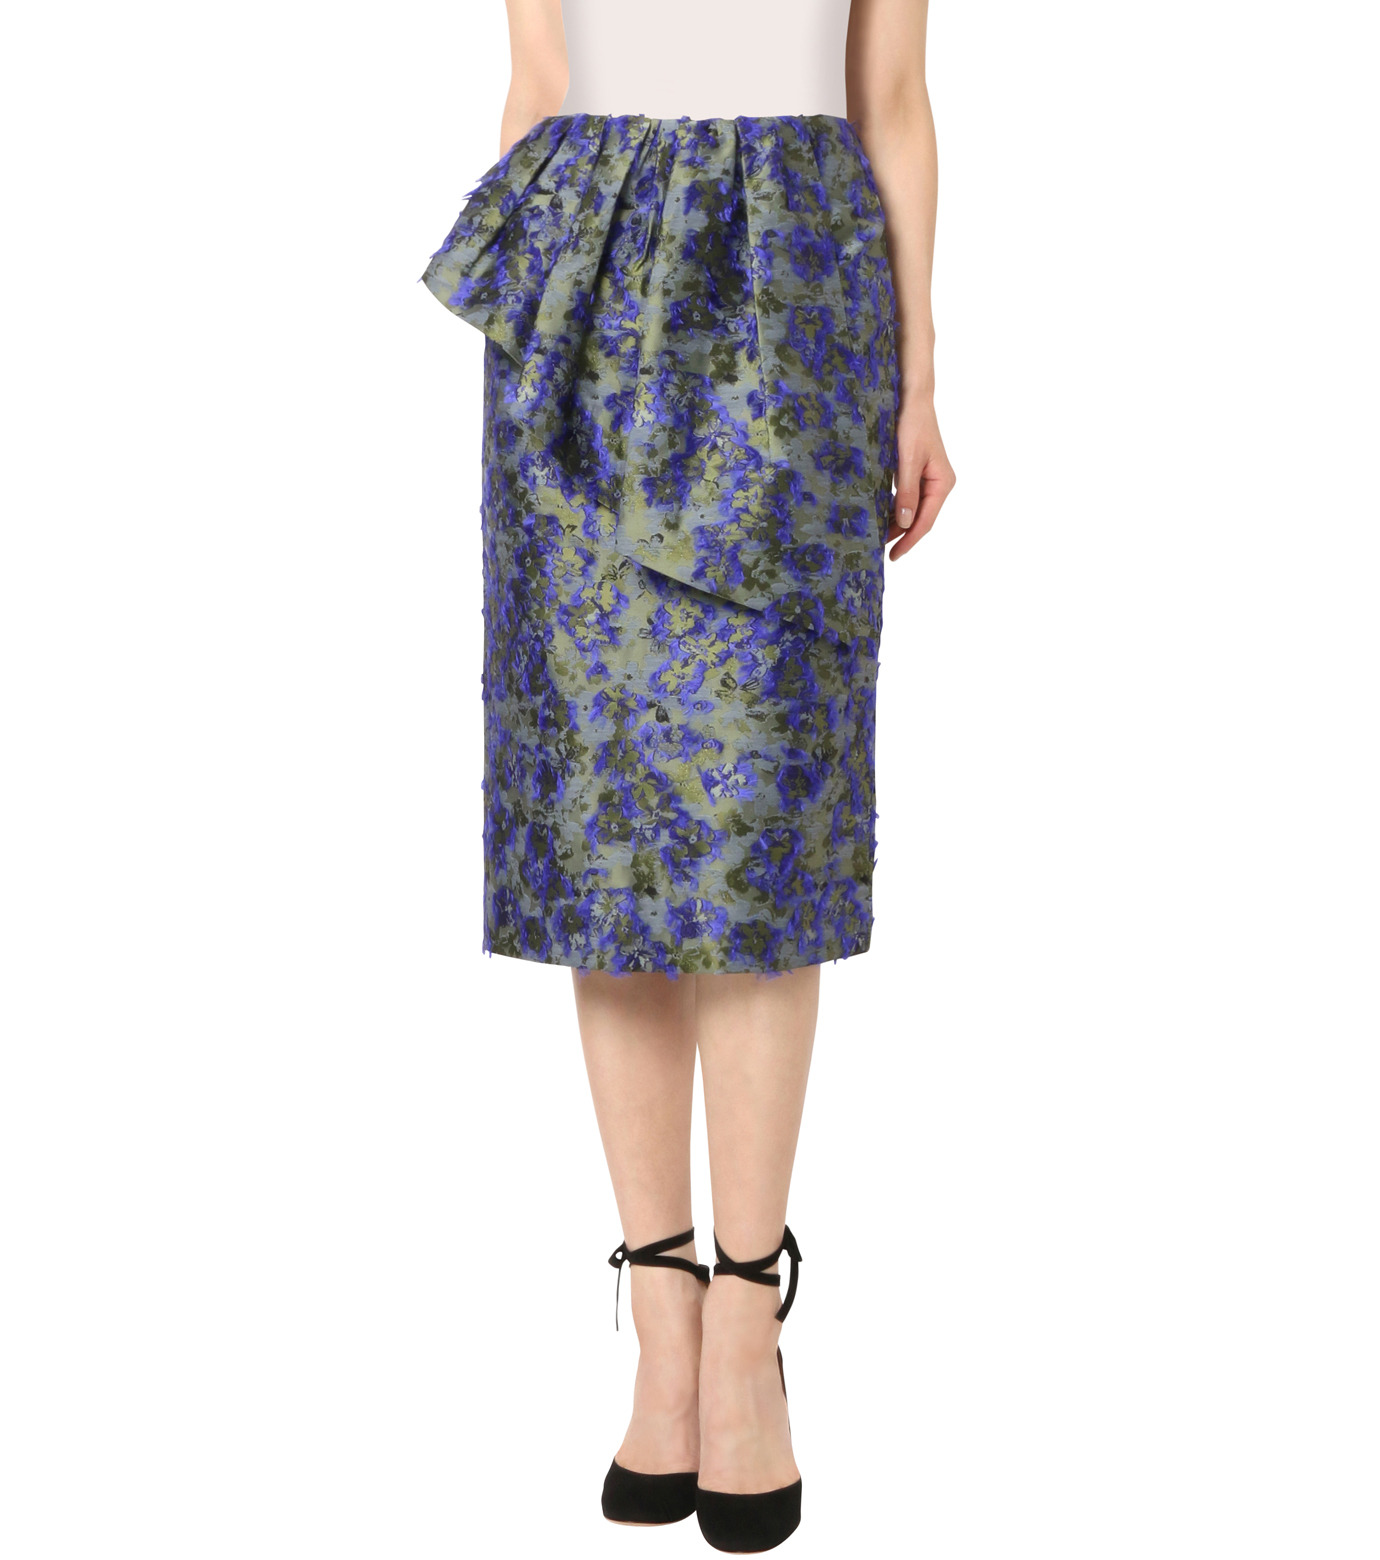 Jourden(ジョーダン)のCobalt Pencil Skirt-BLUE(スカート/skirt)-1603WJ3JA03-92 拡大詳細画像1